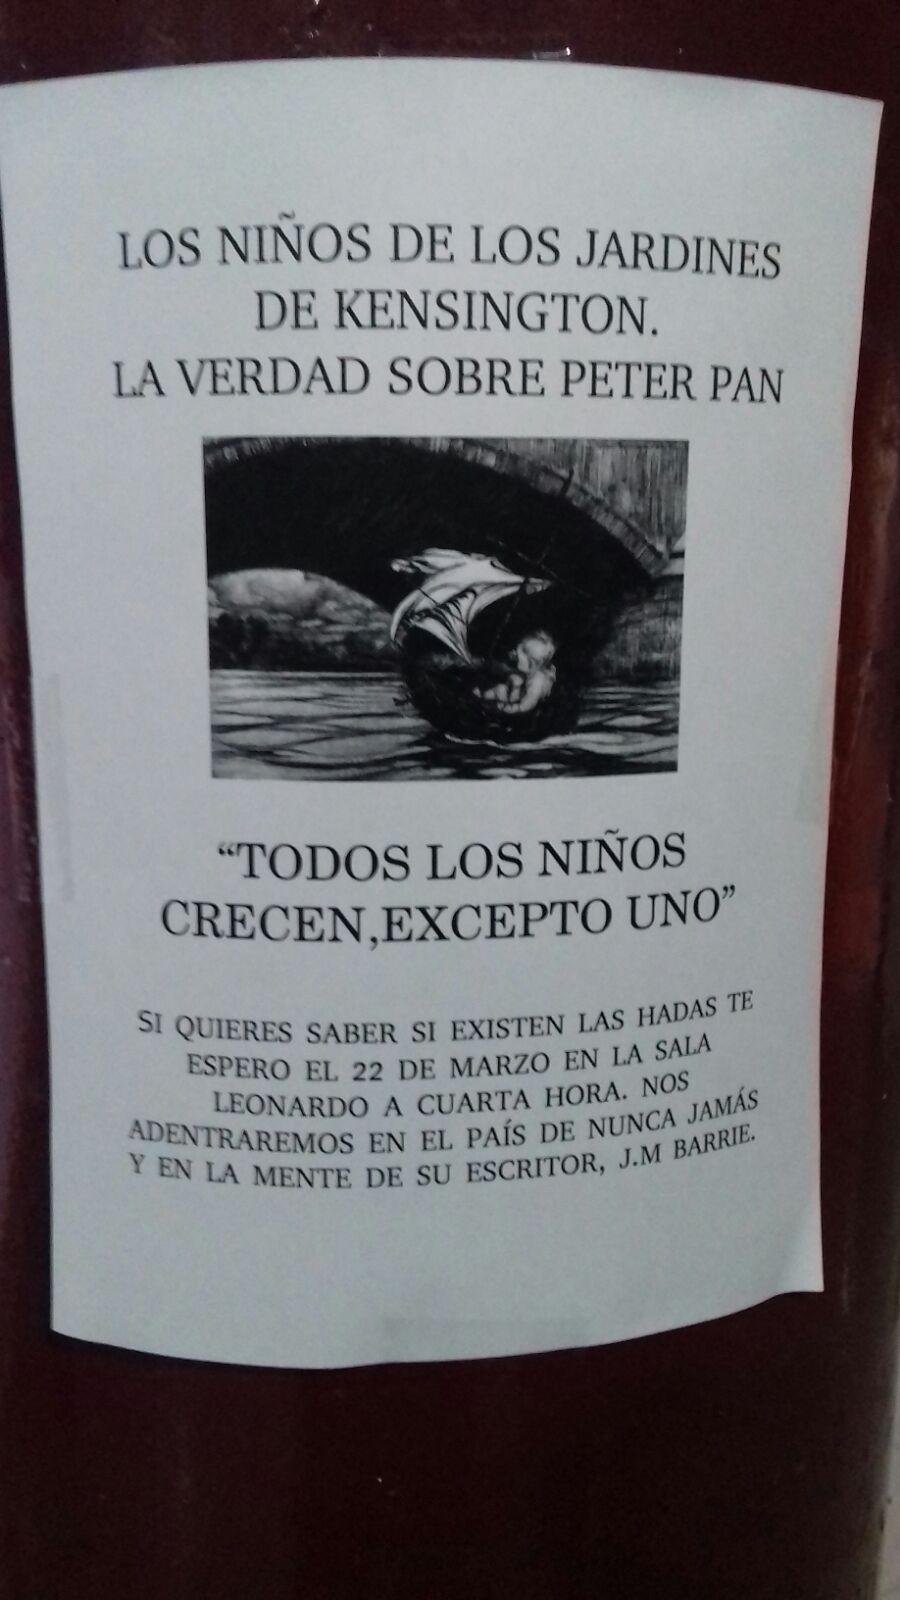 La verdad sobre Peter Pan 3